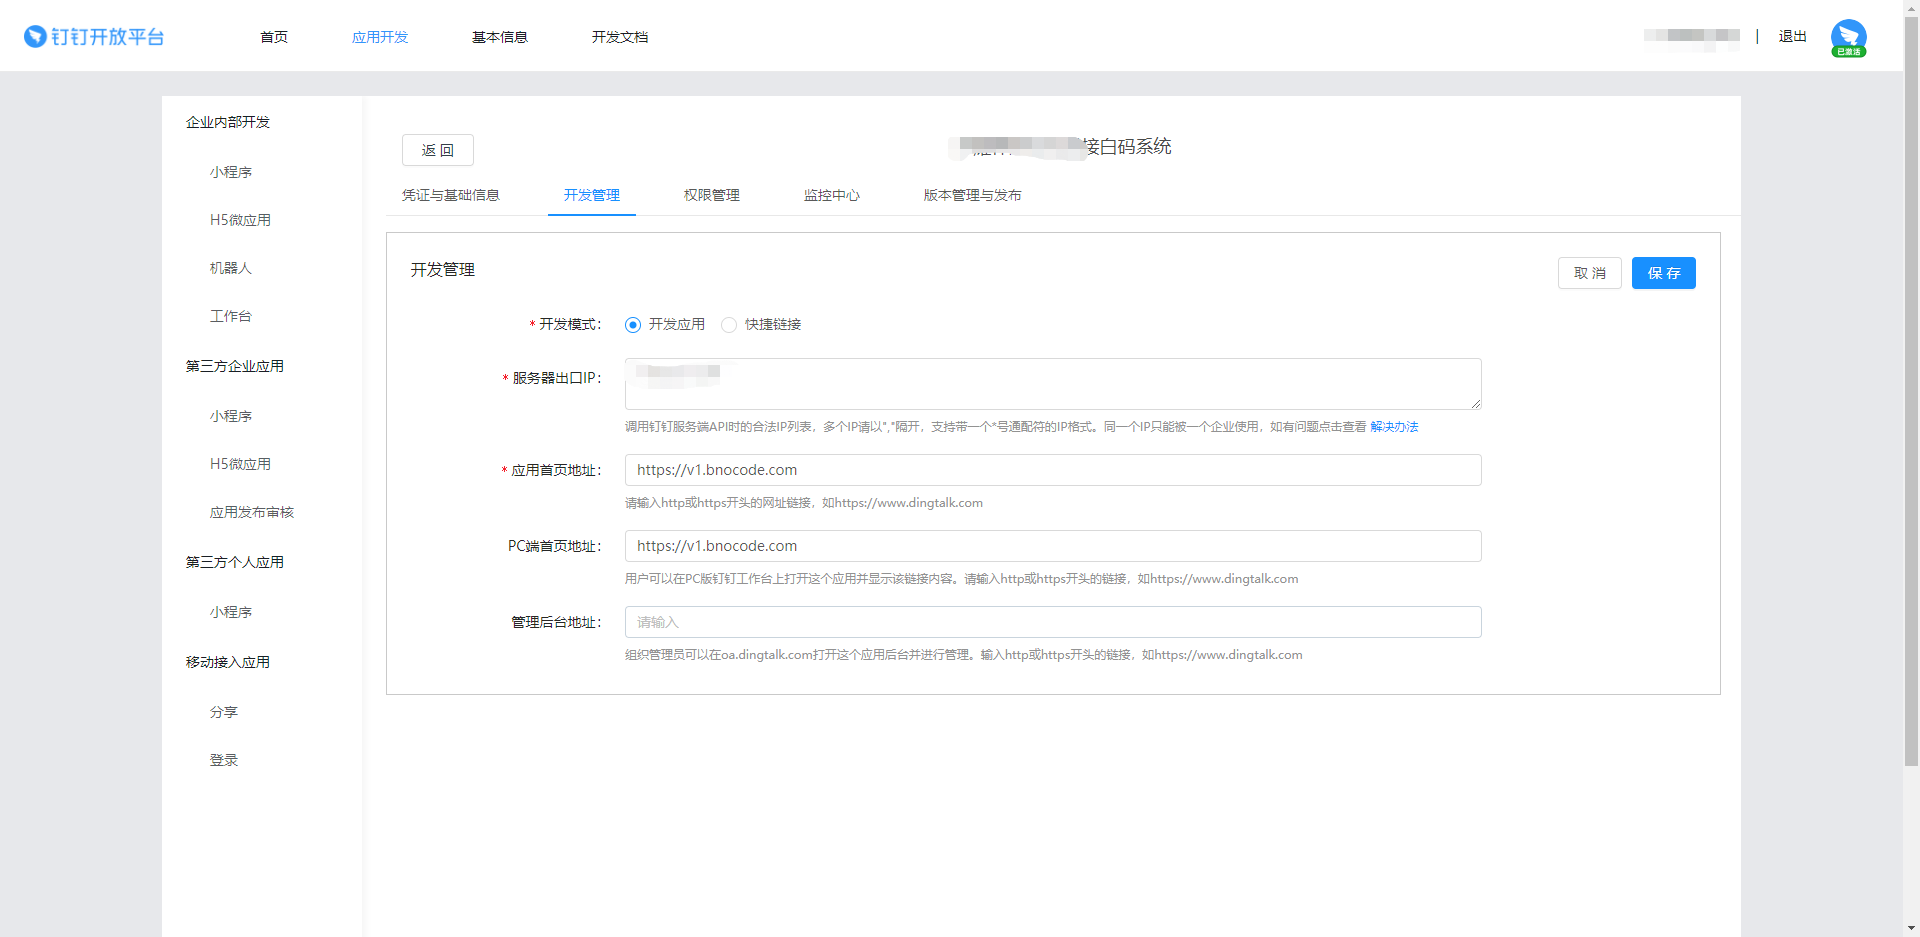 https://pan.bnocode.com/project/5ccfc7ad044c8e018c8c5d36/attachment/20200925/1601001292383_%E9%92%89%E9%92%8914.png